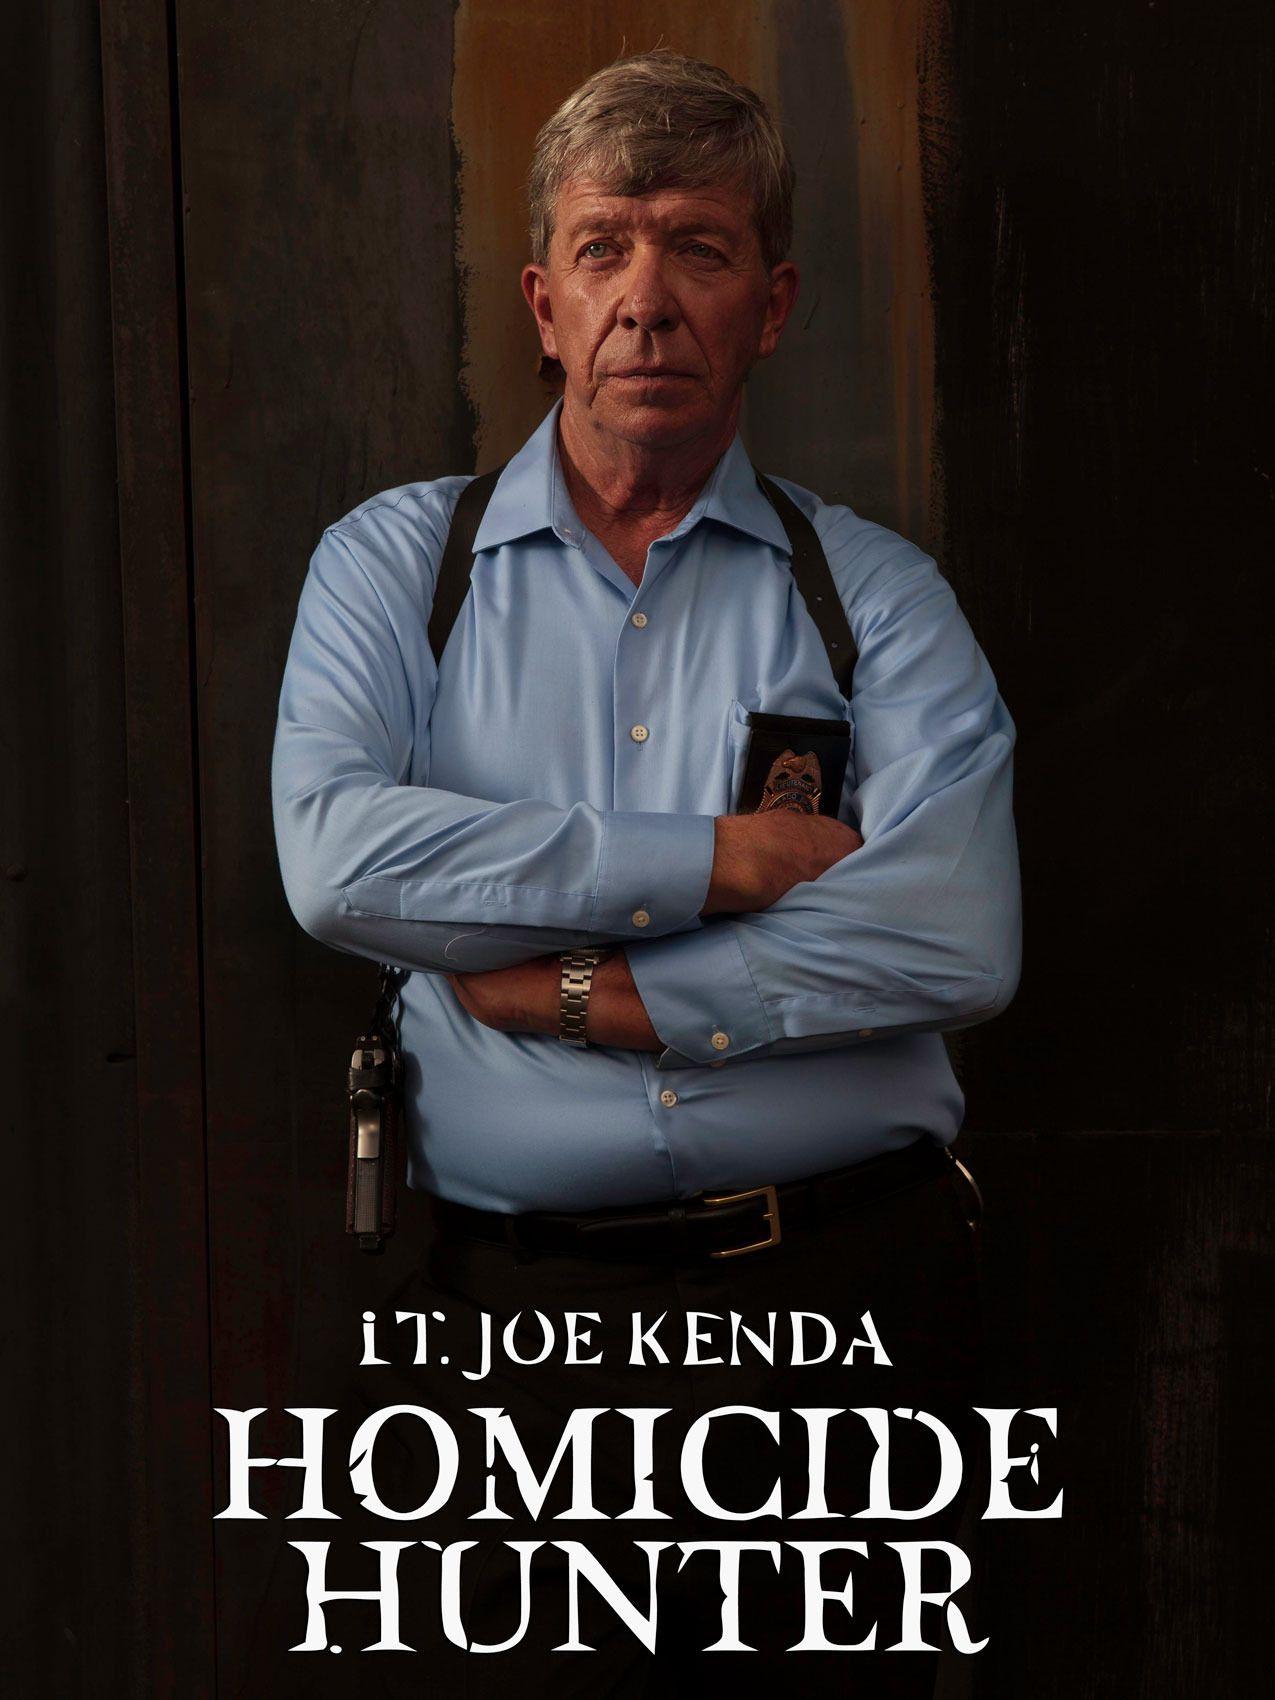 I\'m watching Homicide Hunter: Lt. Joe Kenda, I think you might like ...